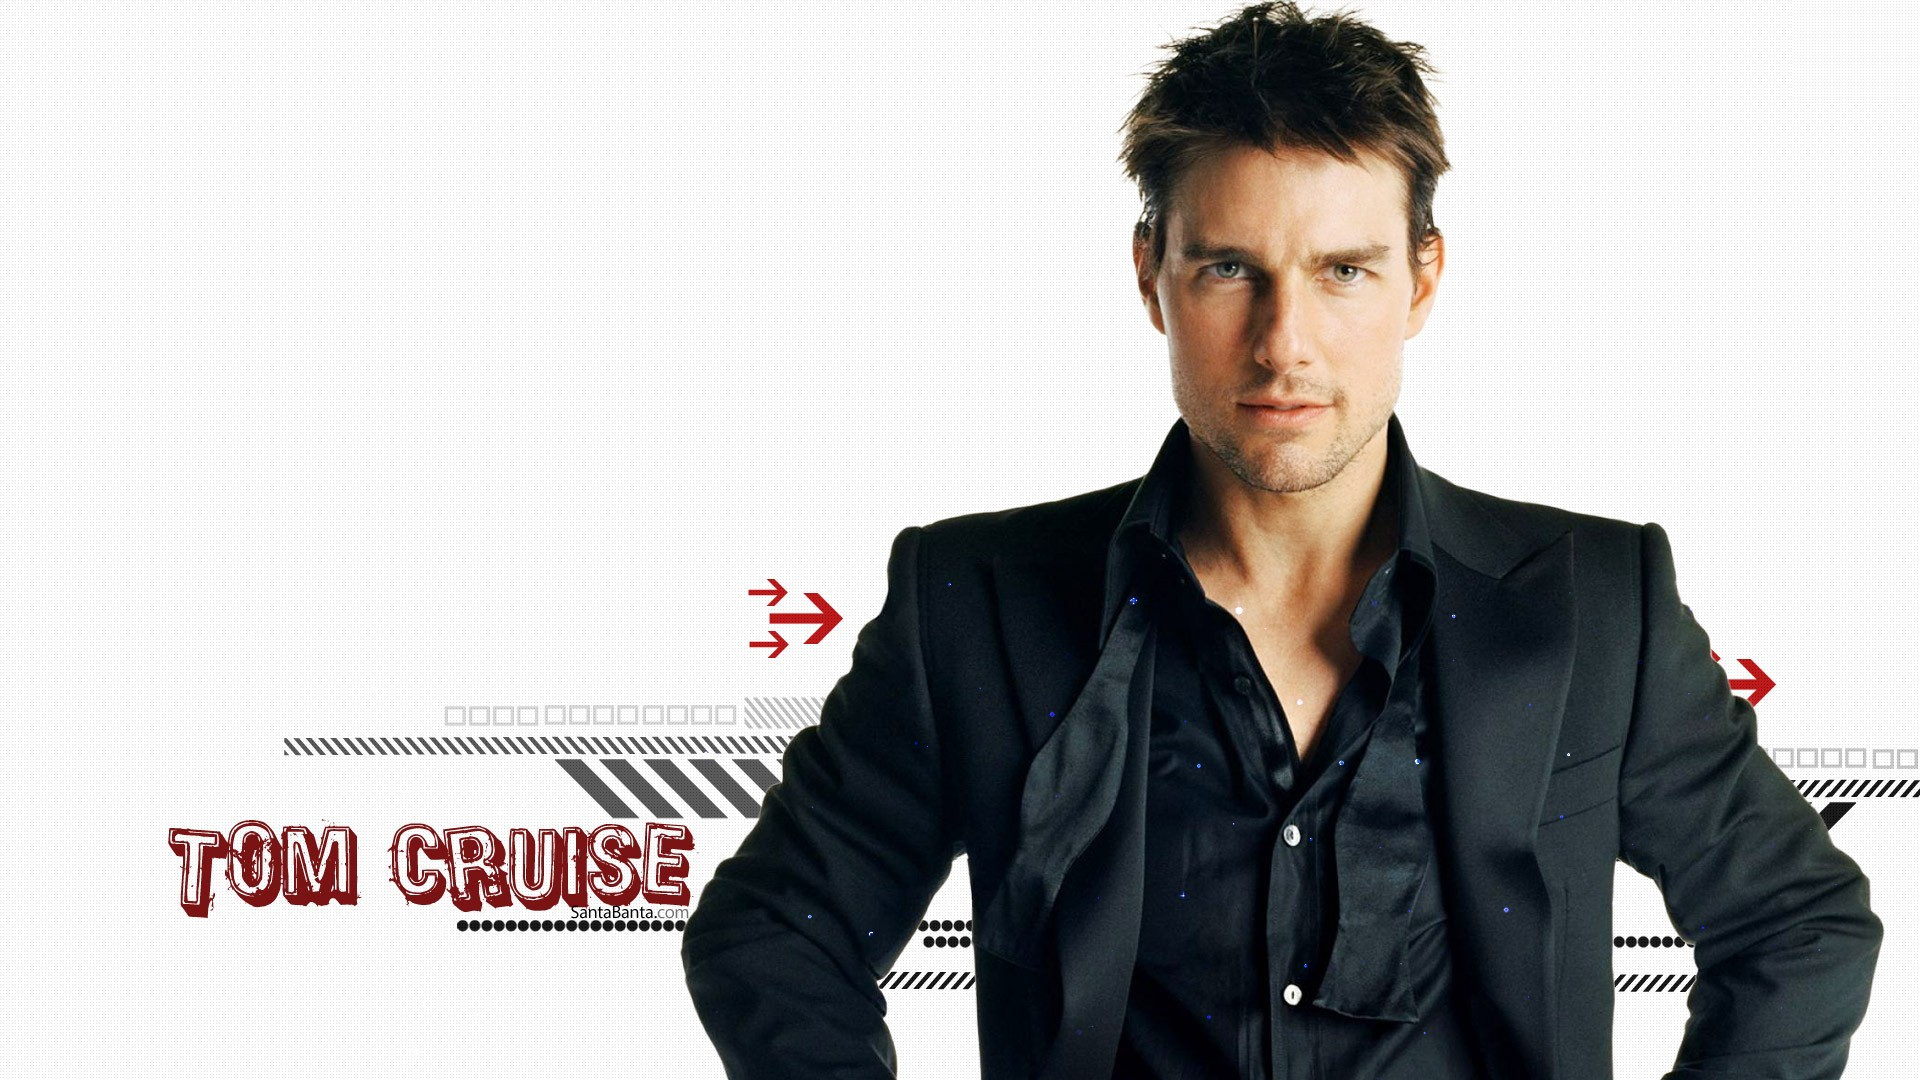 Tom Cruise Wallpaper 7